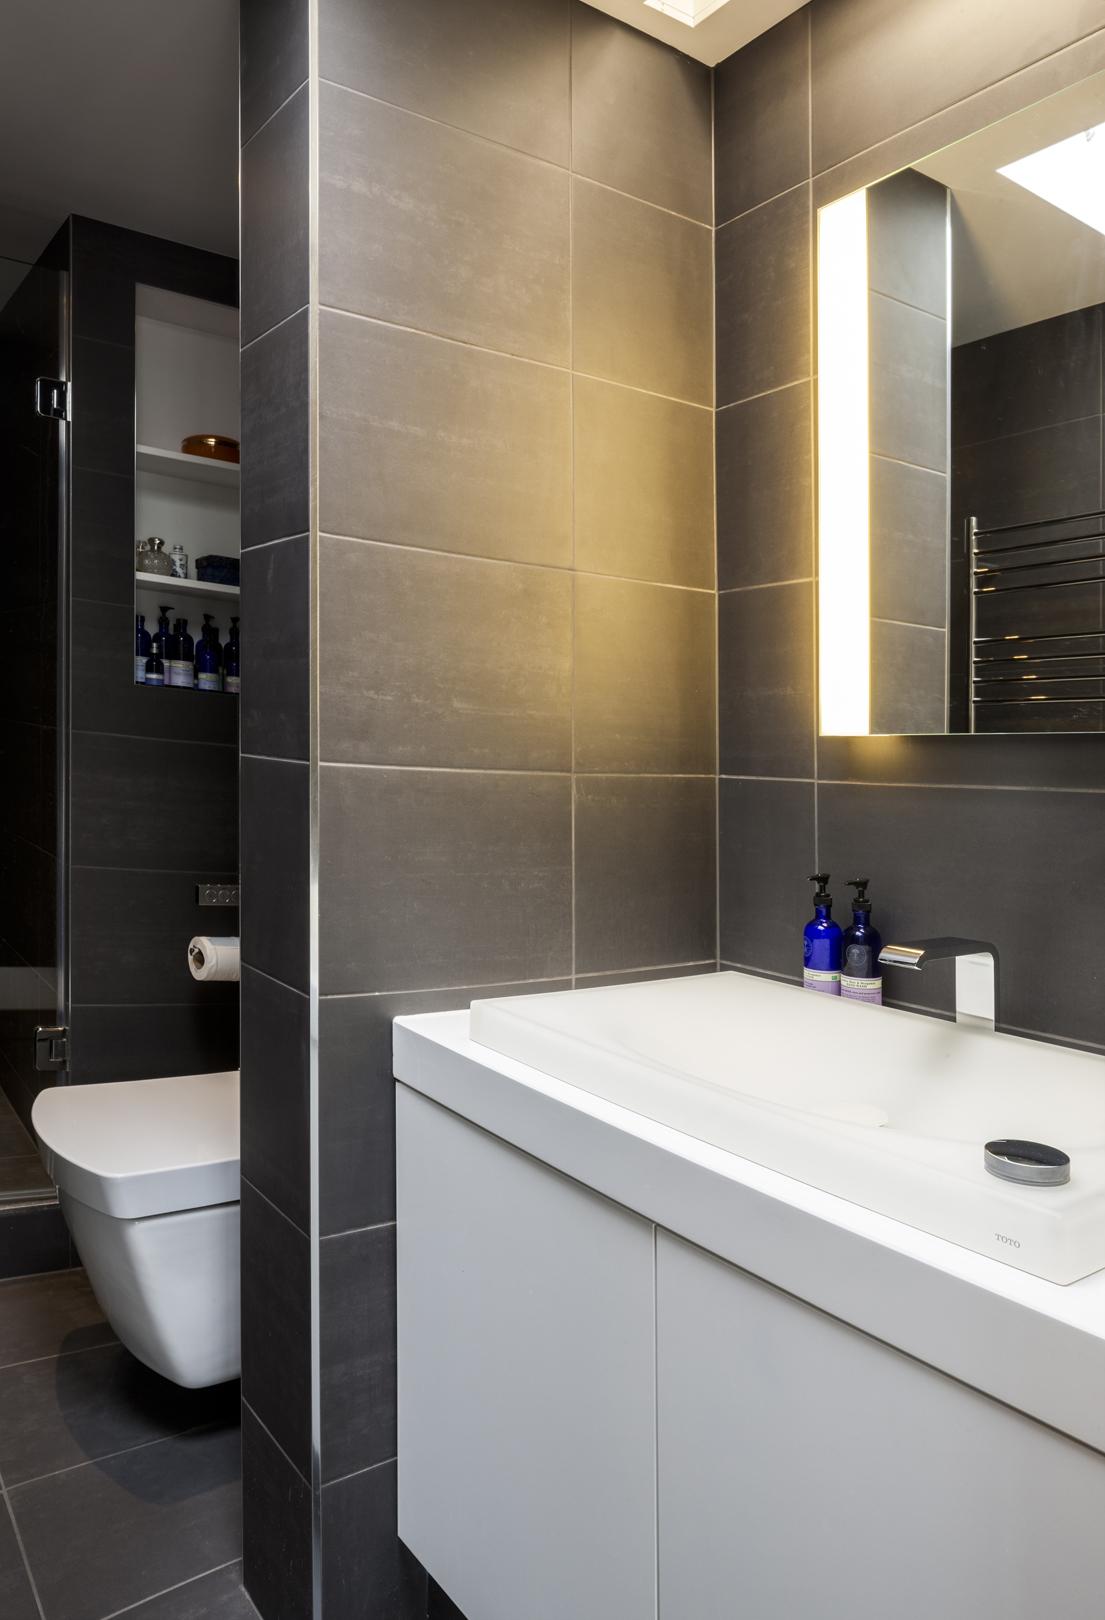 Bathroom Brand Toto Brings Luxury To Grand Designs Inside Id